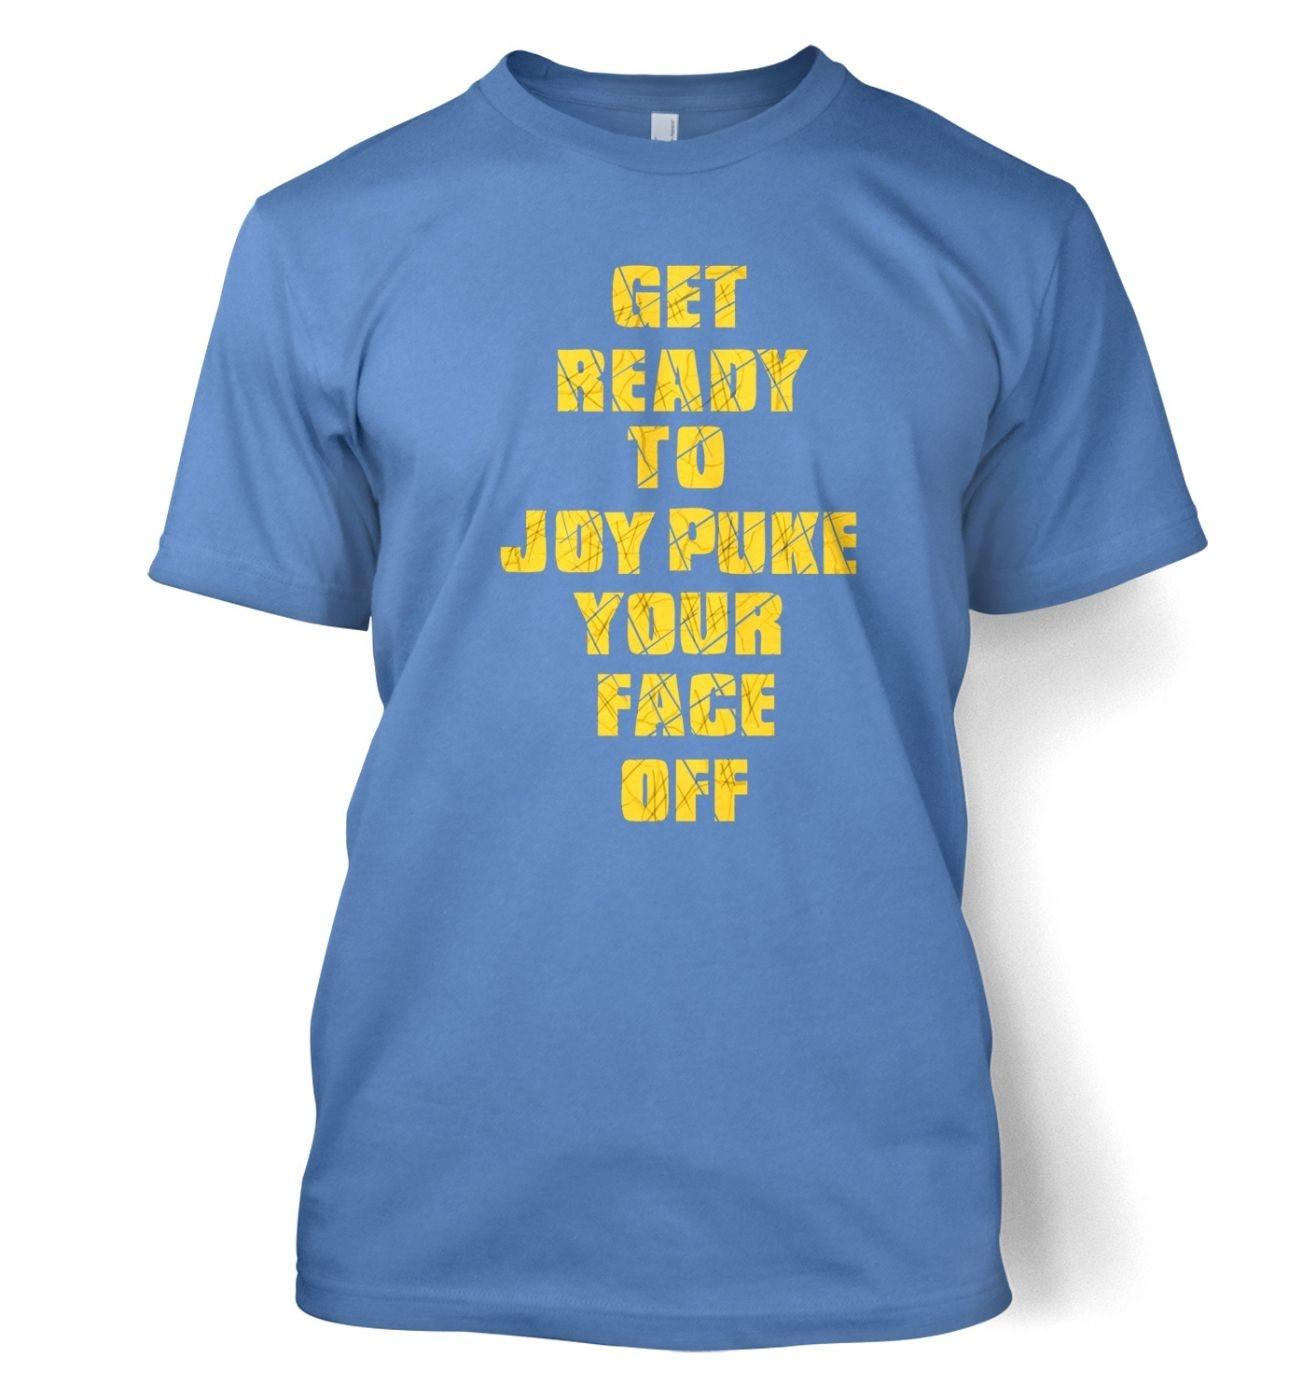 Get Ready To Joy Puke Your Face Off men's t-shirt